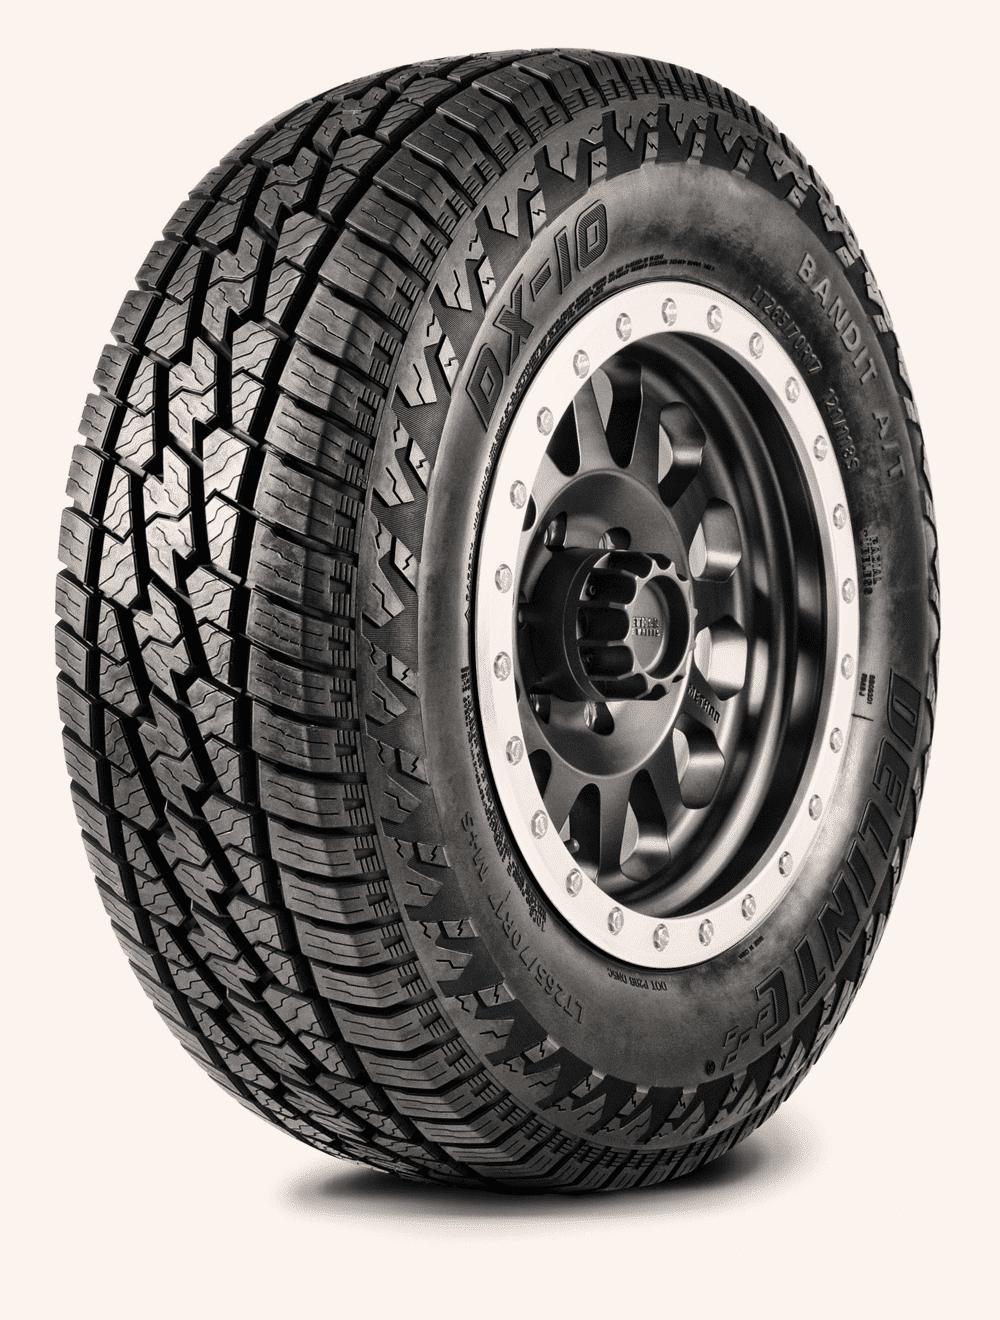 Delinte The Bandit A/T Tire